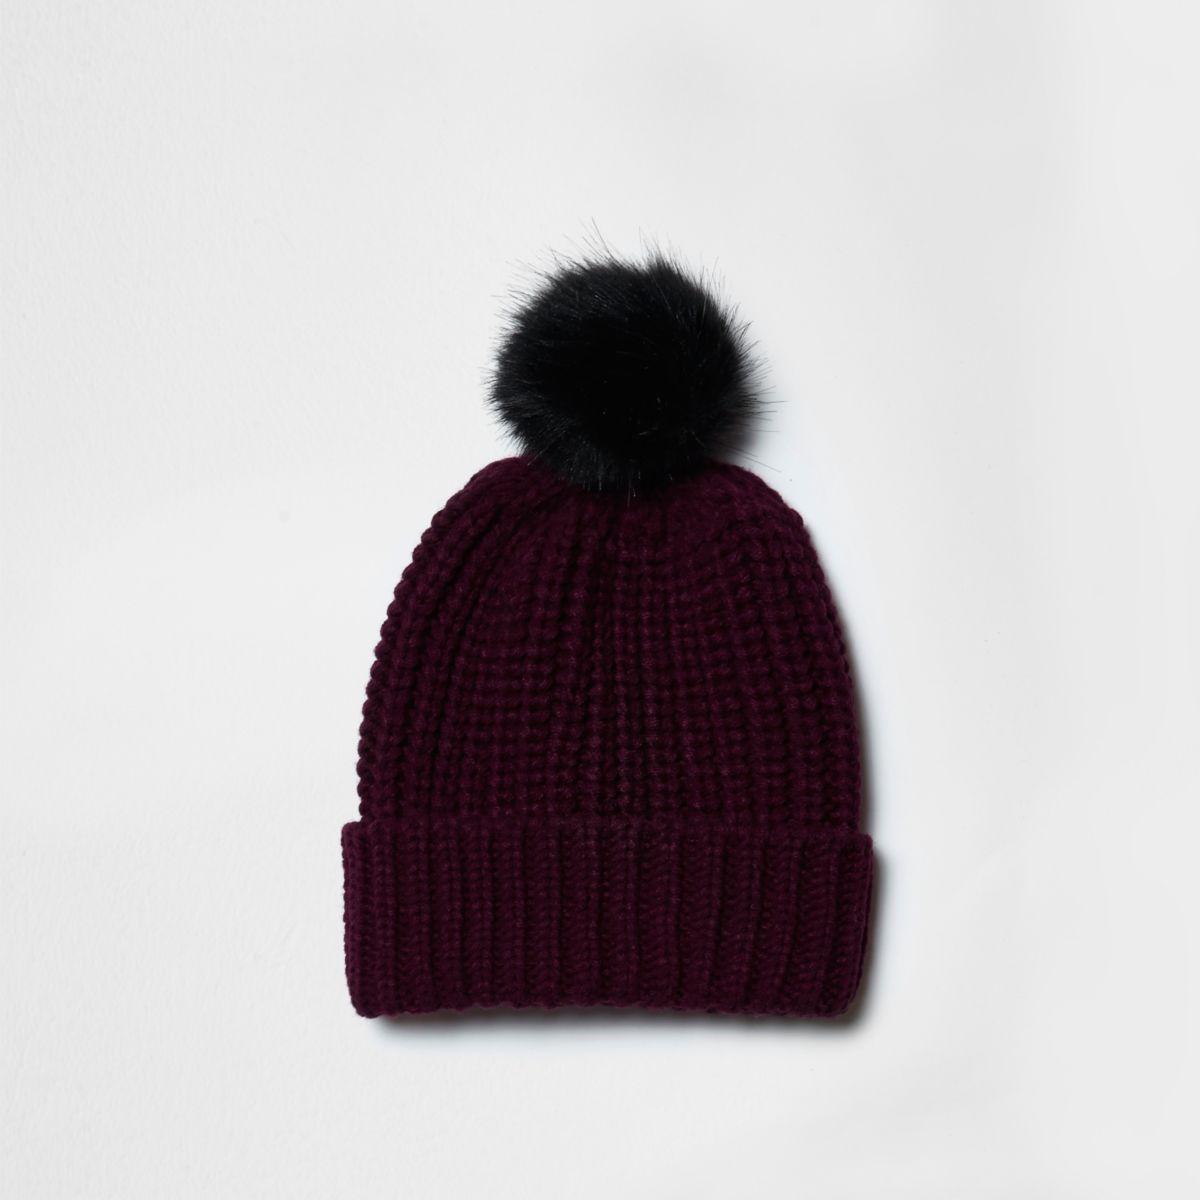 Burgundy knit bobble hat